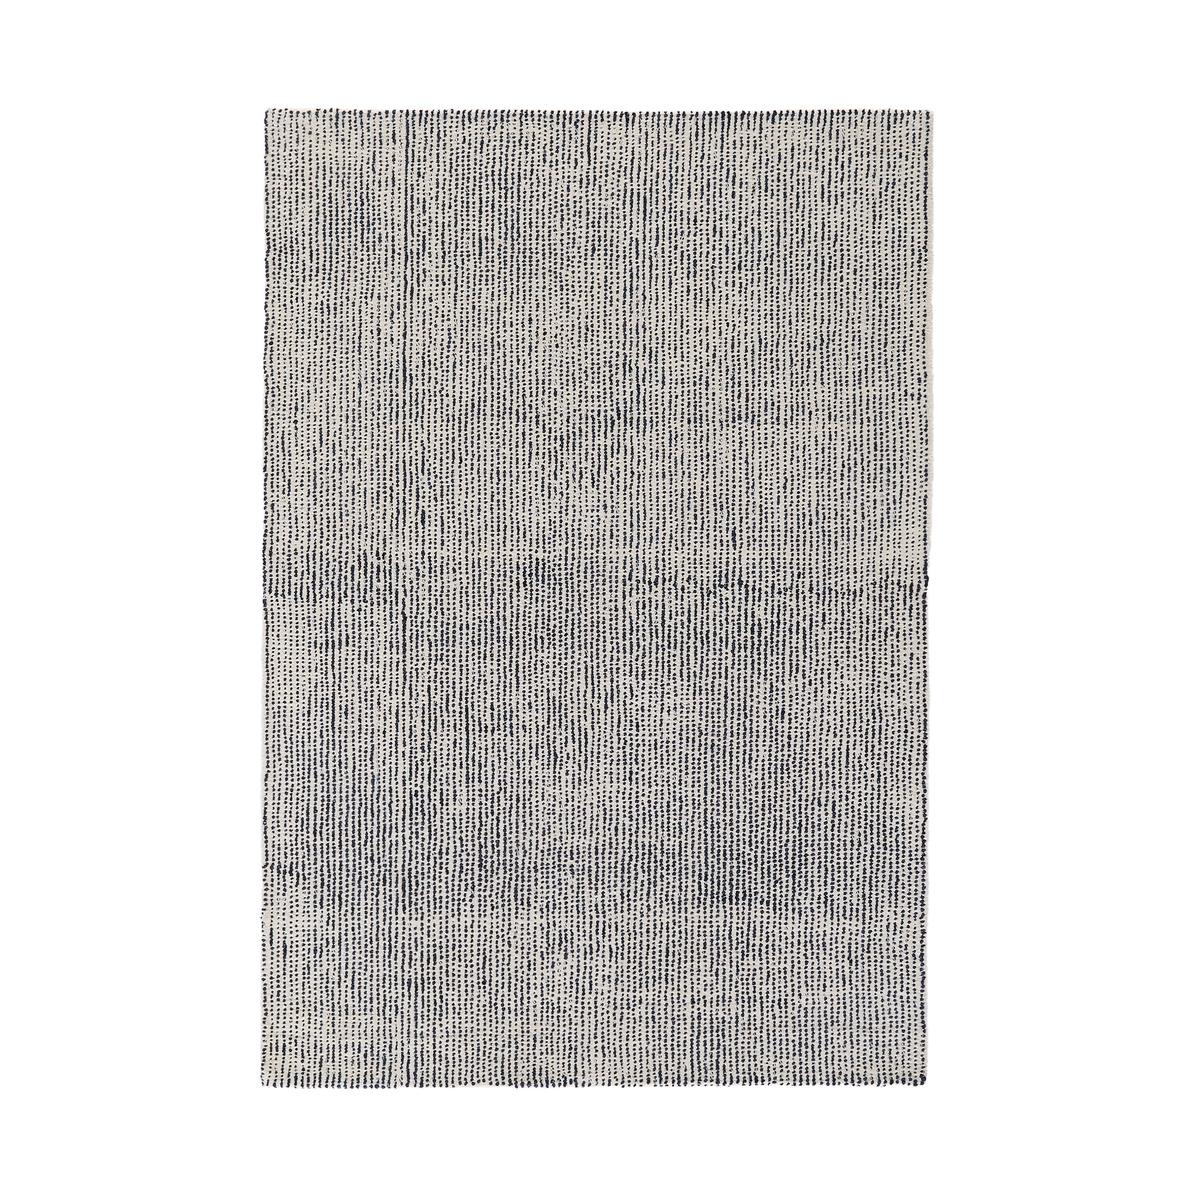 Ковер La Redoute Берберский из шерсти Narva 120 x 170 см бежевый ковер la redoute из шерсти 120 x 170 см розовый